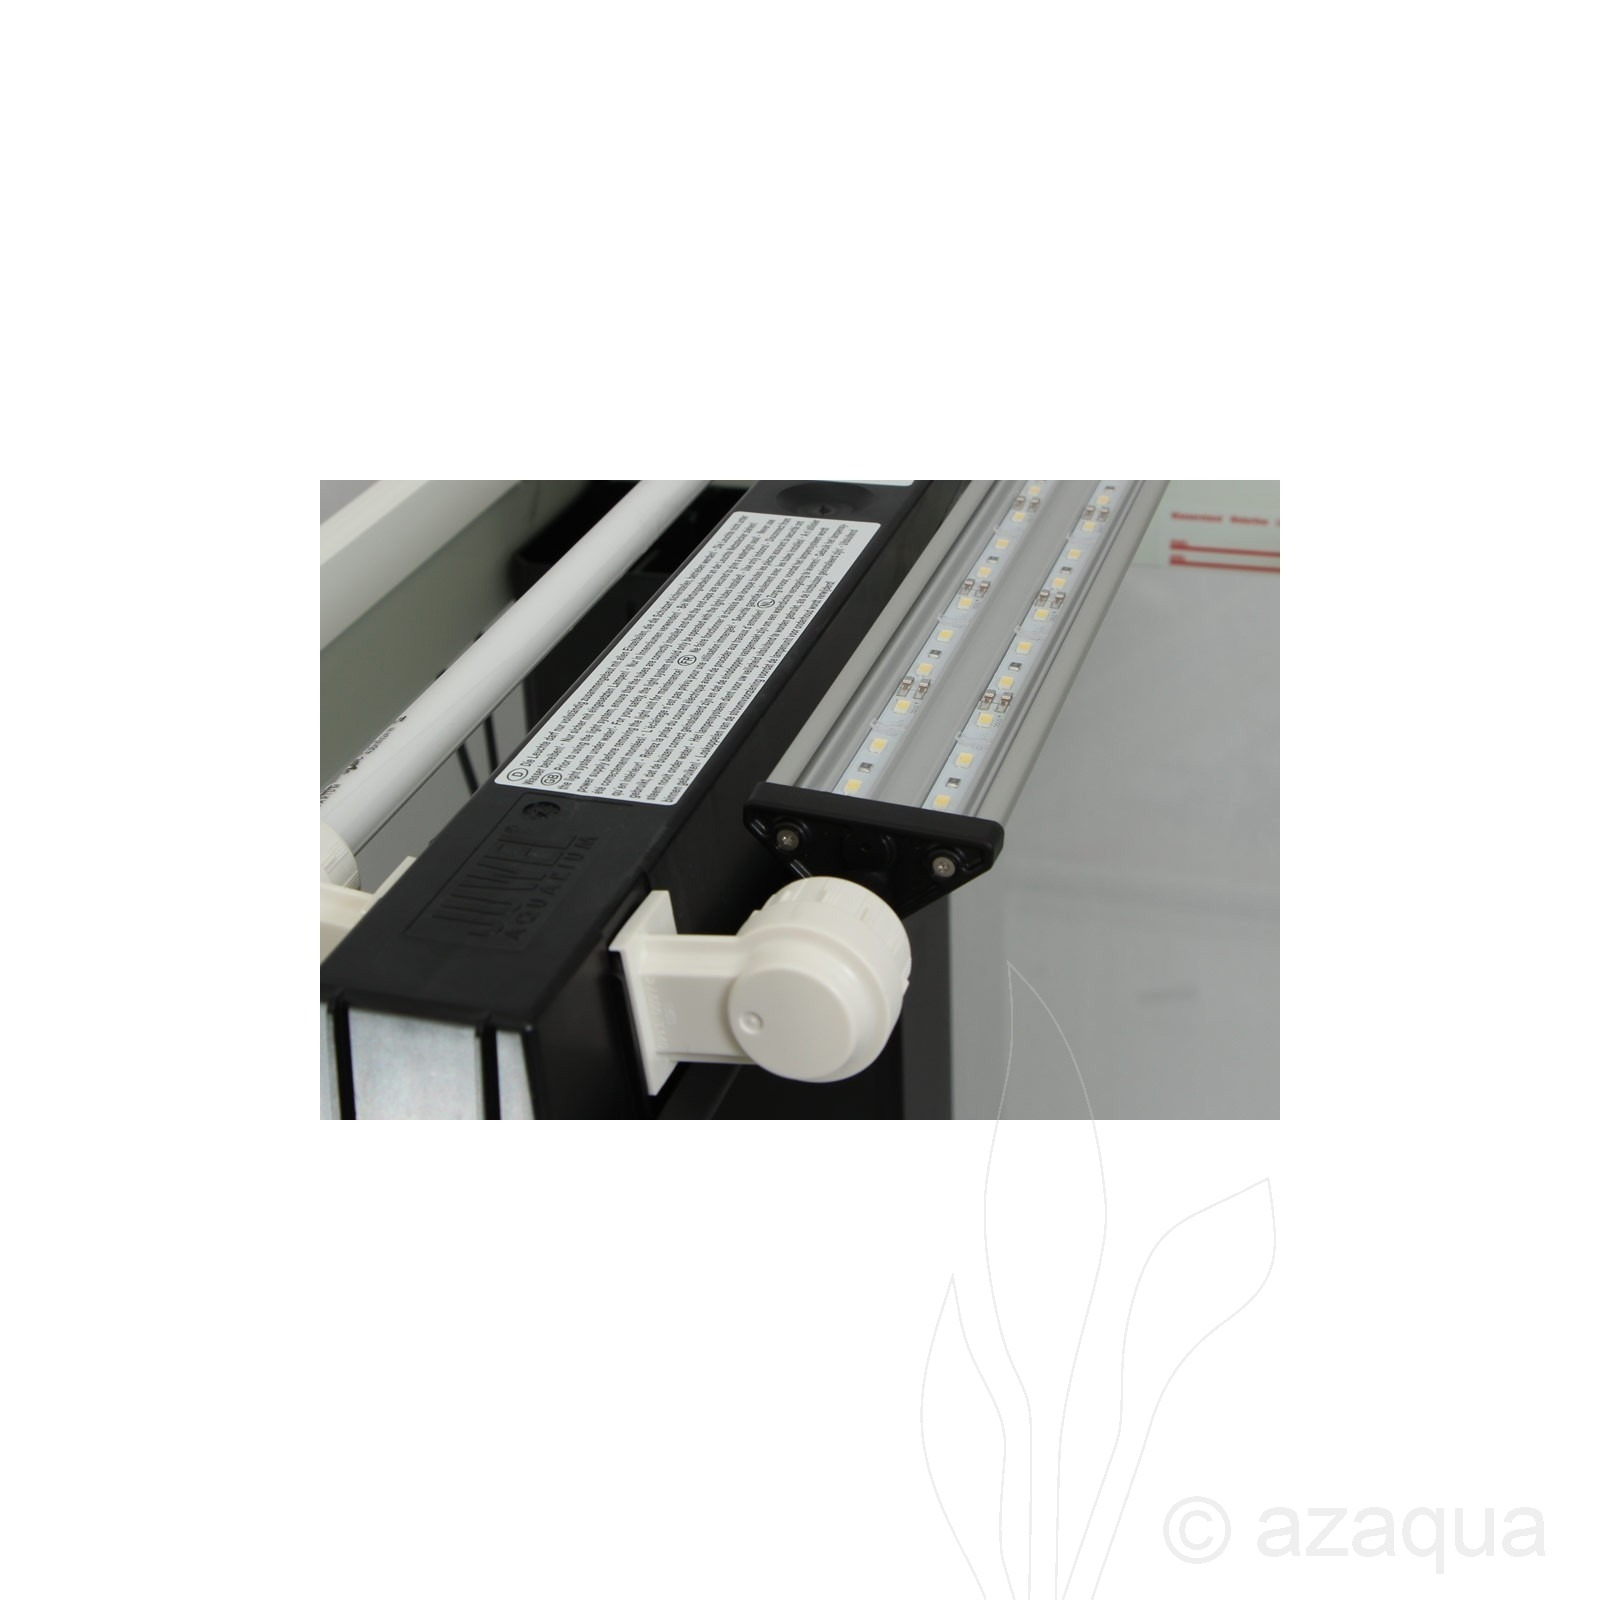 daytime eco t8 montage tl verlichting vervangen voor led verlichting